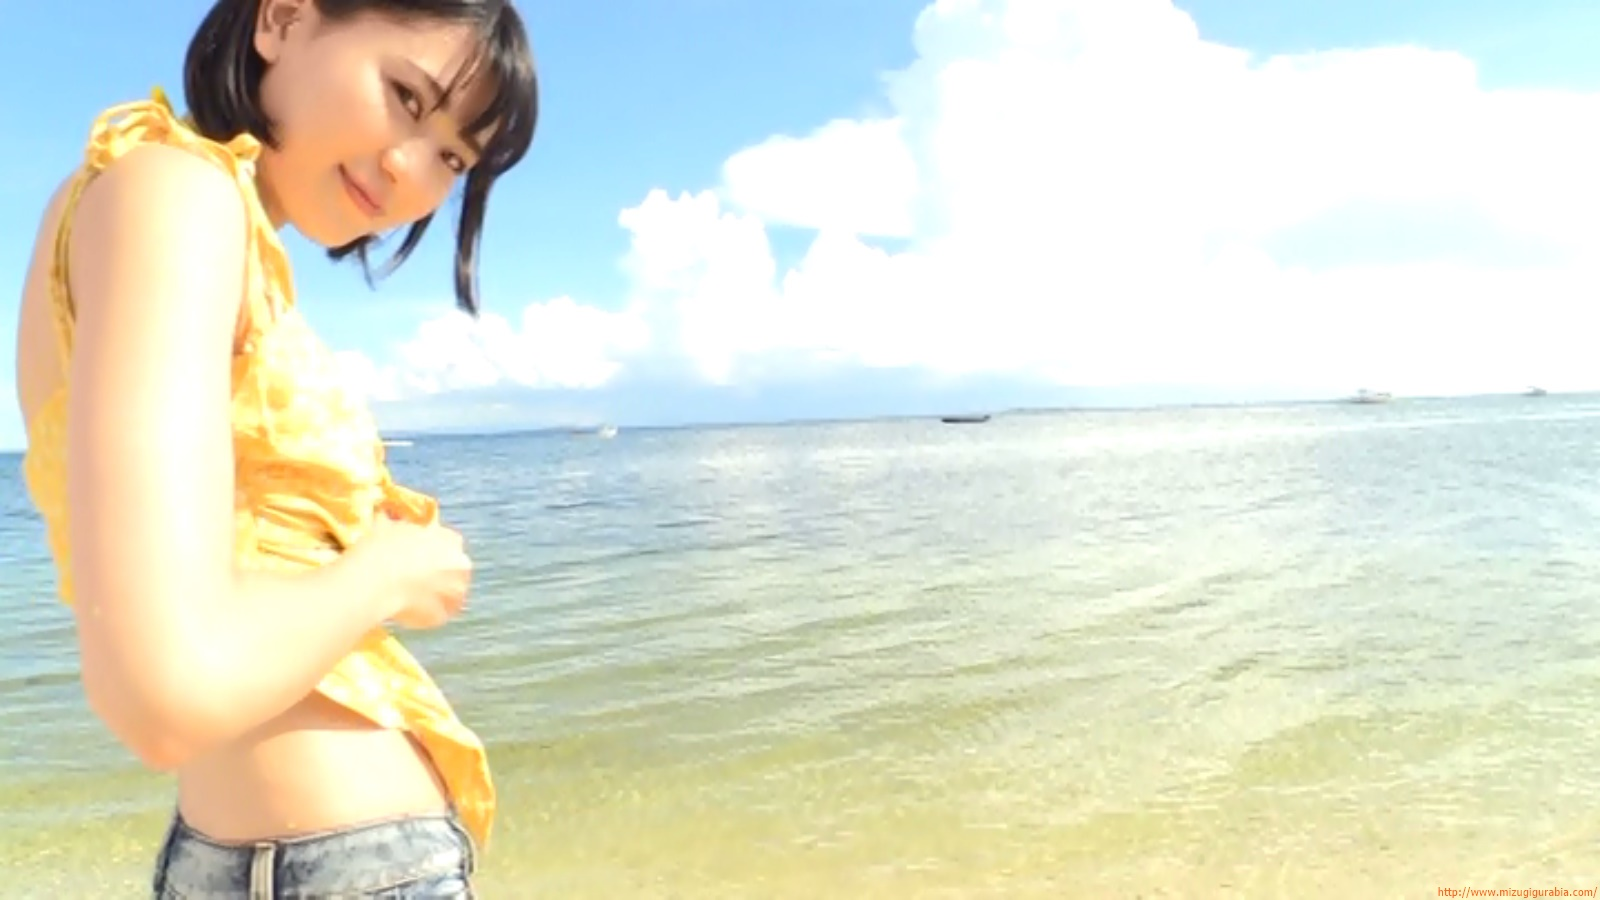 Beach dating107